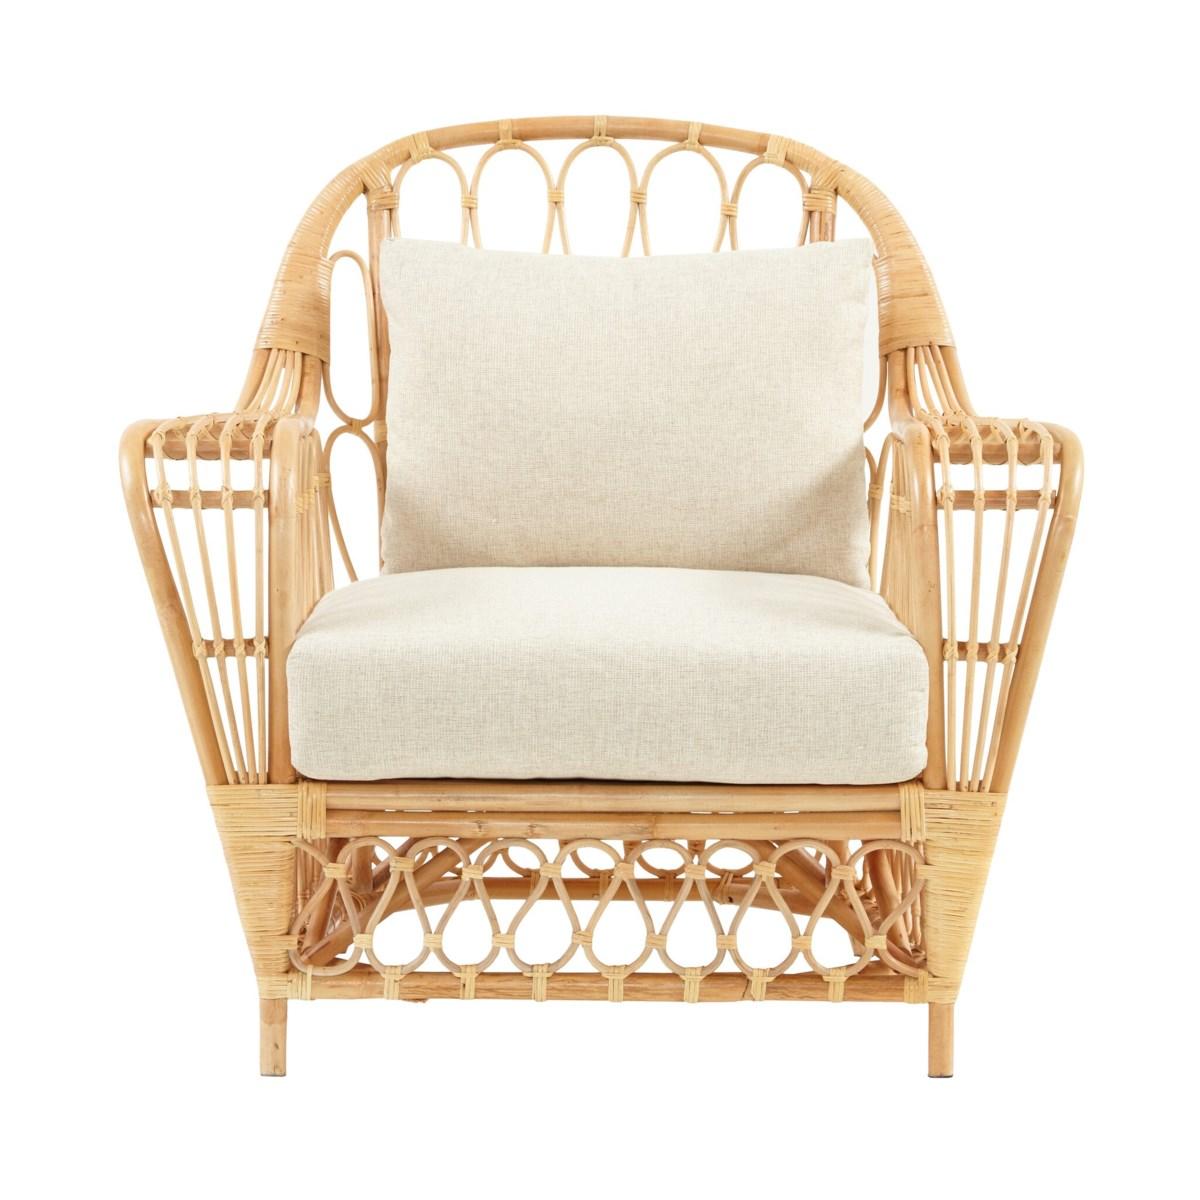 Bar Harbor Club Chair Color - Natural Cushion Color - Cream